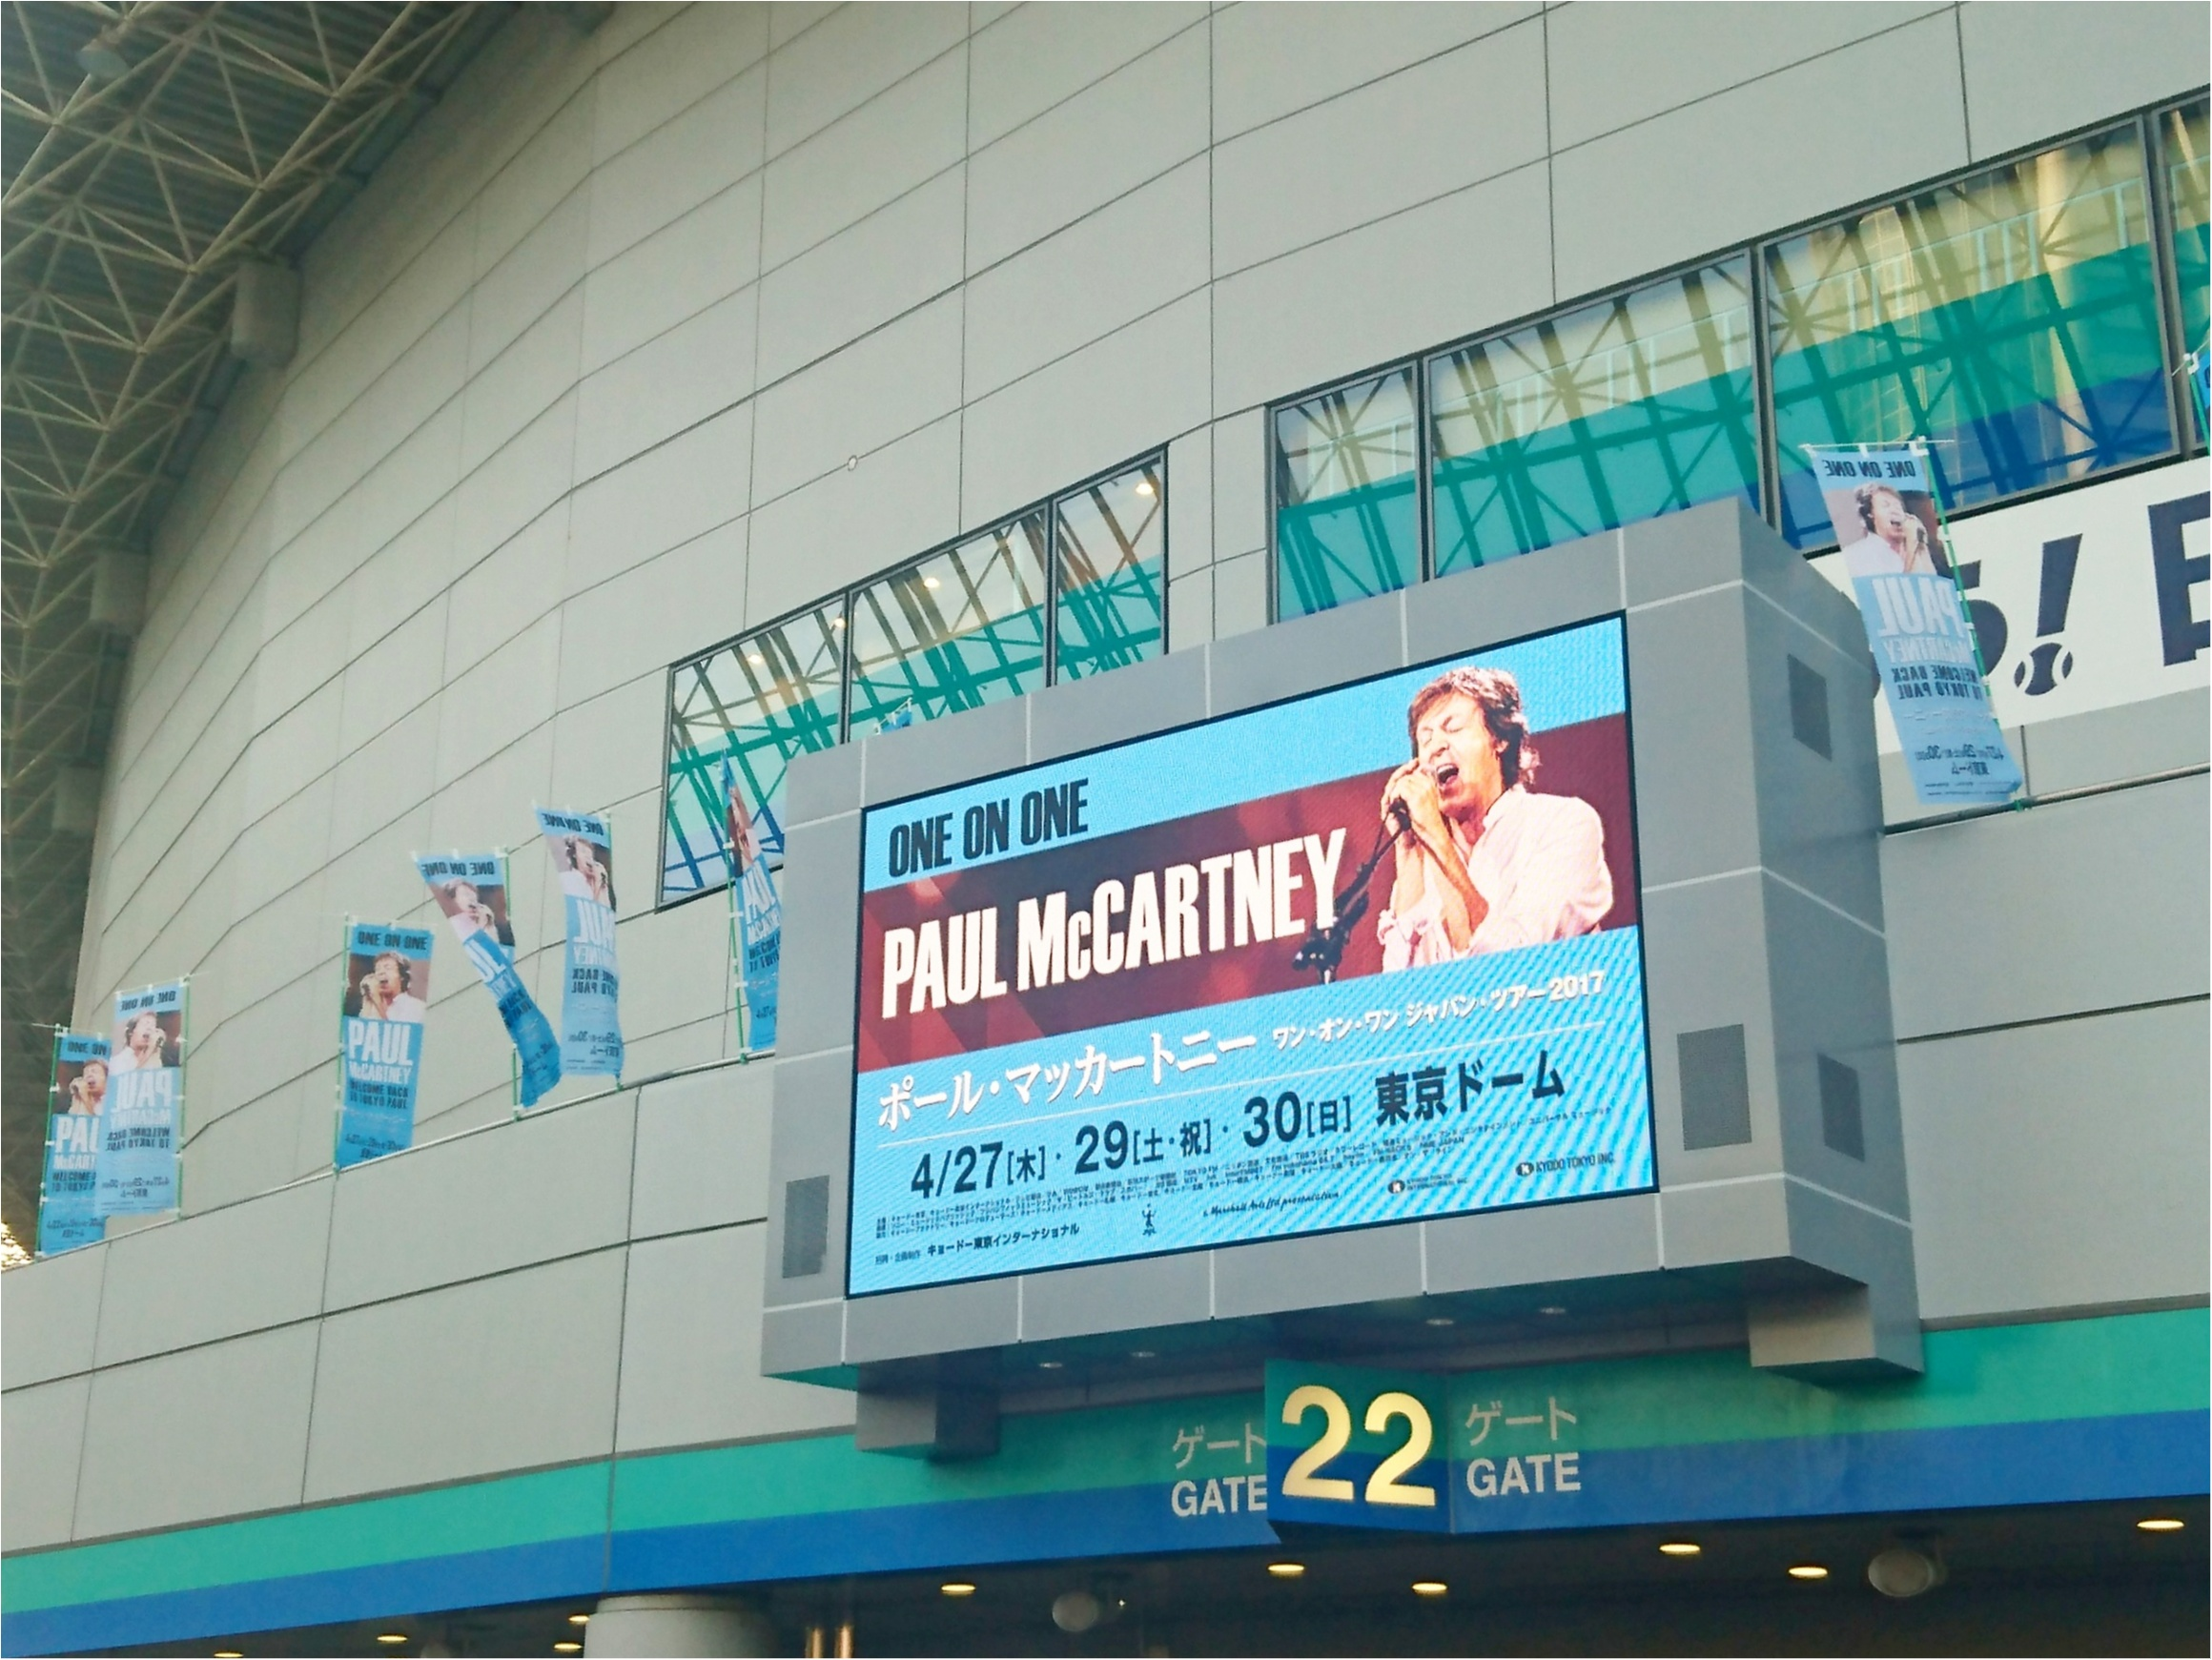 【LIVE】PAUL McCARTNEY 来日公演 『 ONE ON ONE 』Japan tour 2017 ♪_1